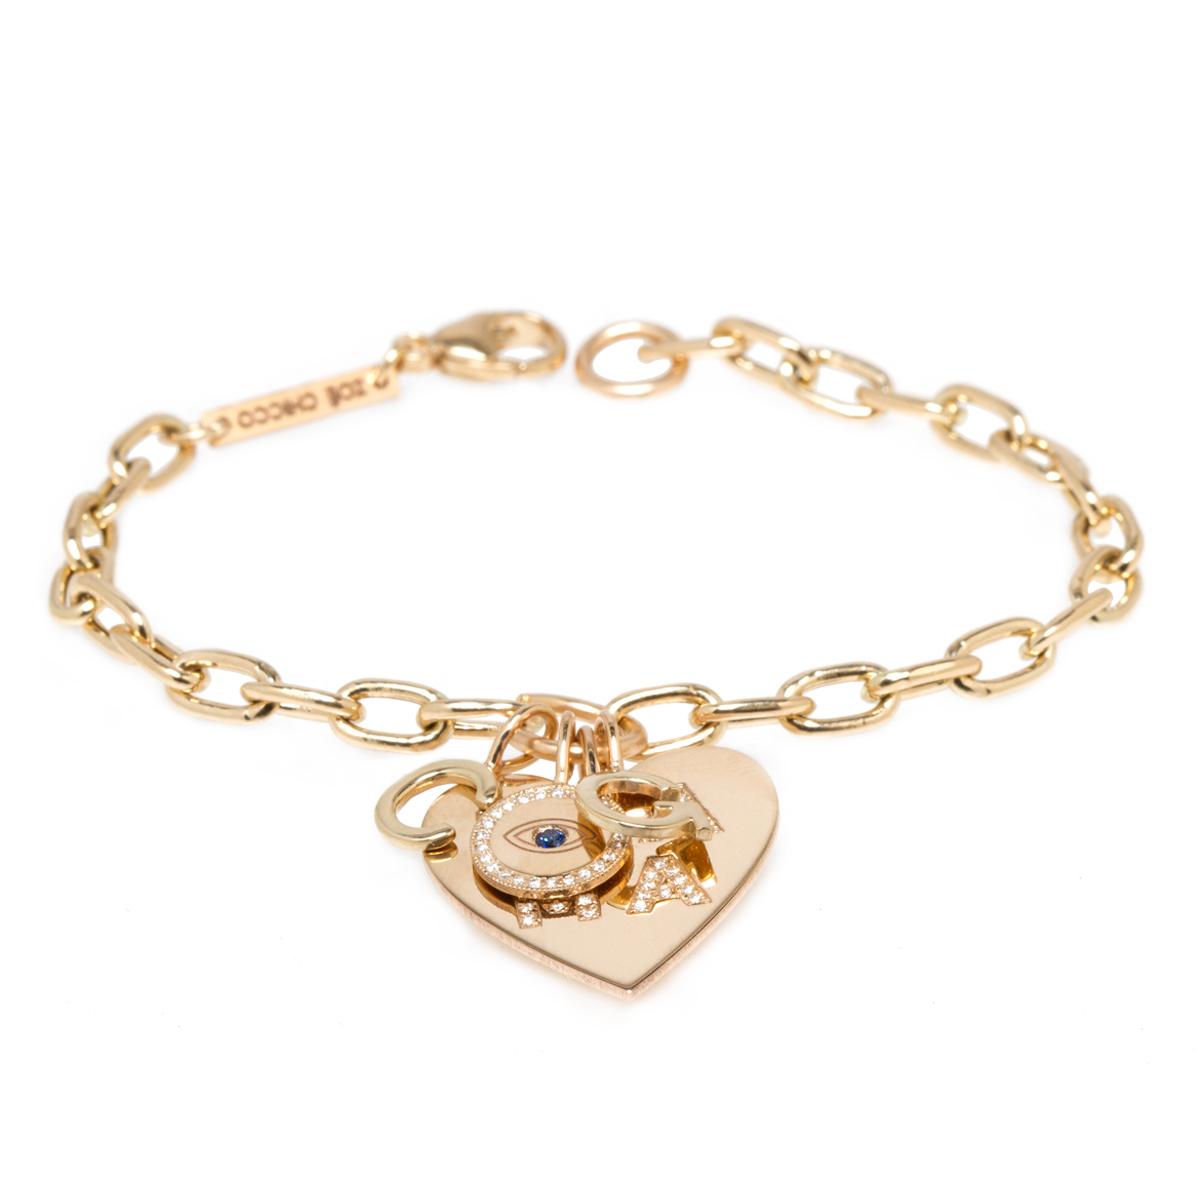 Ariane Goldman x Zoe Chicco Customizable Multi Charm Bracelet 1